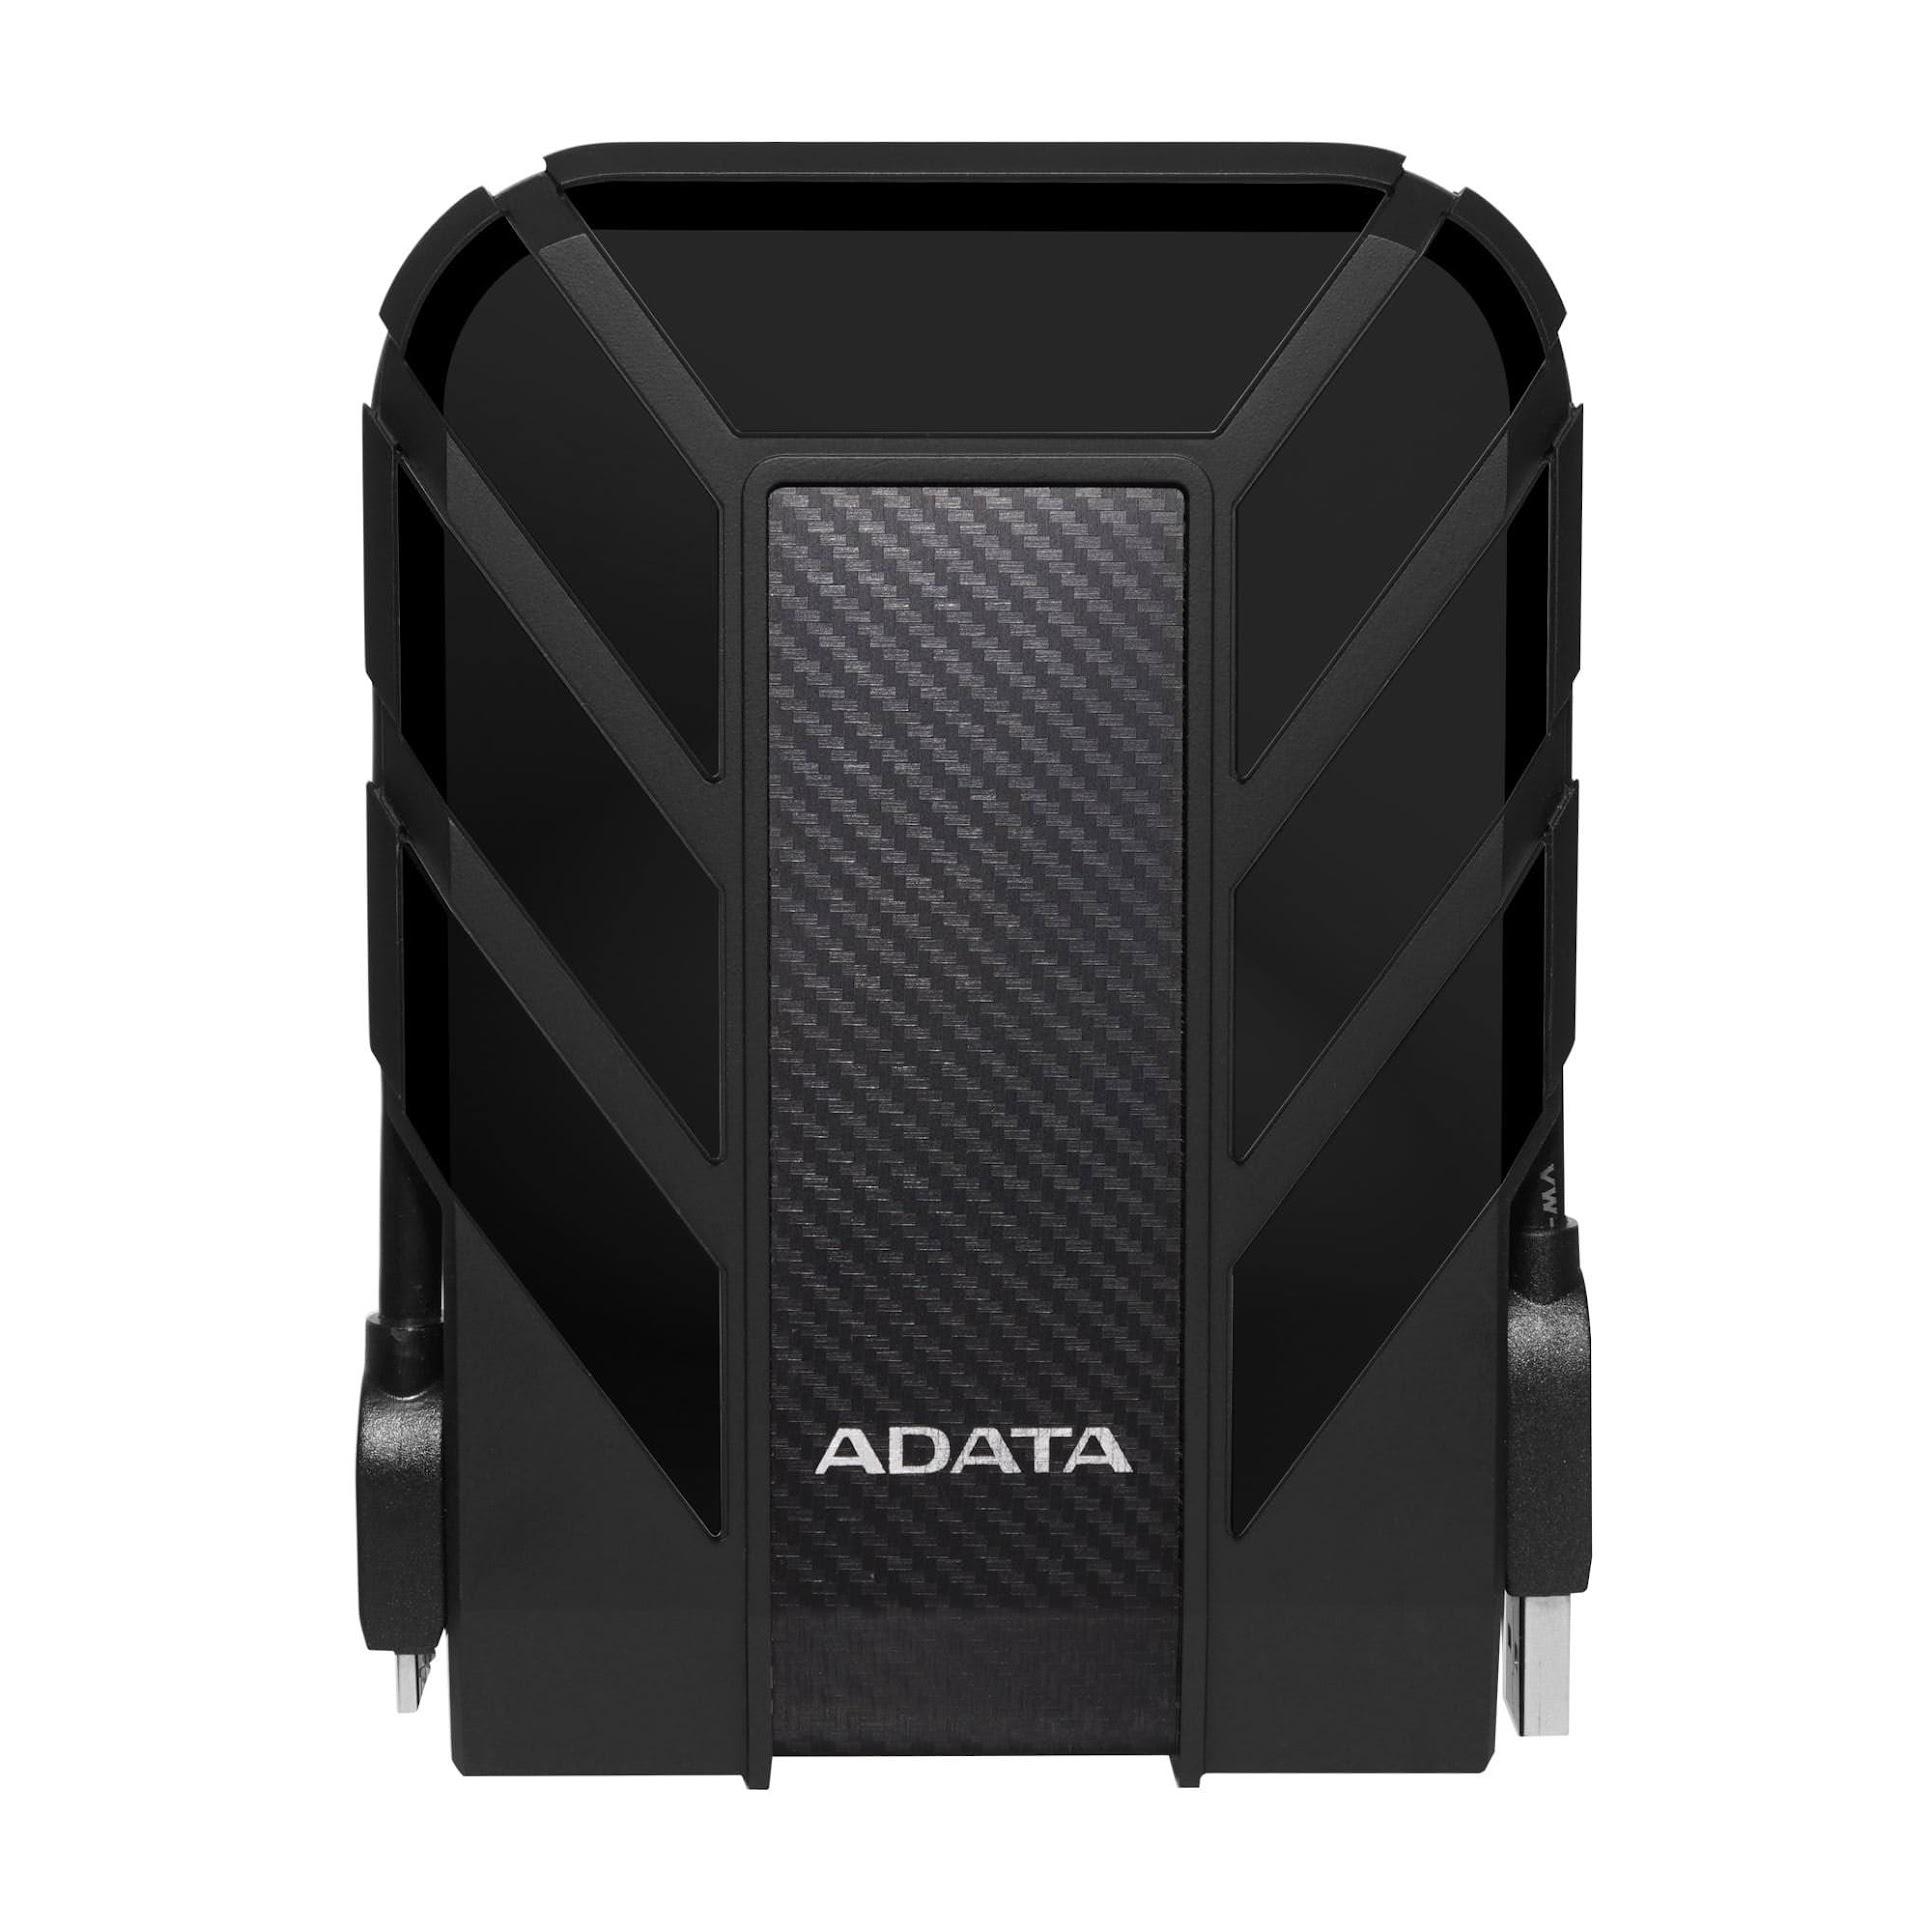 ADATA HD680 front